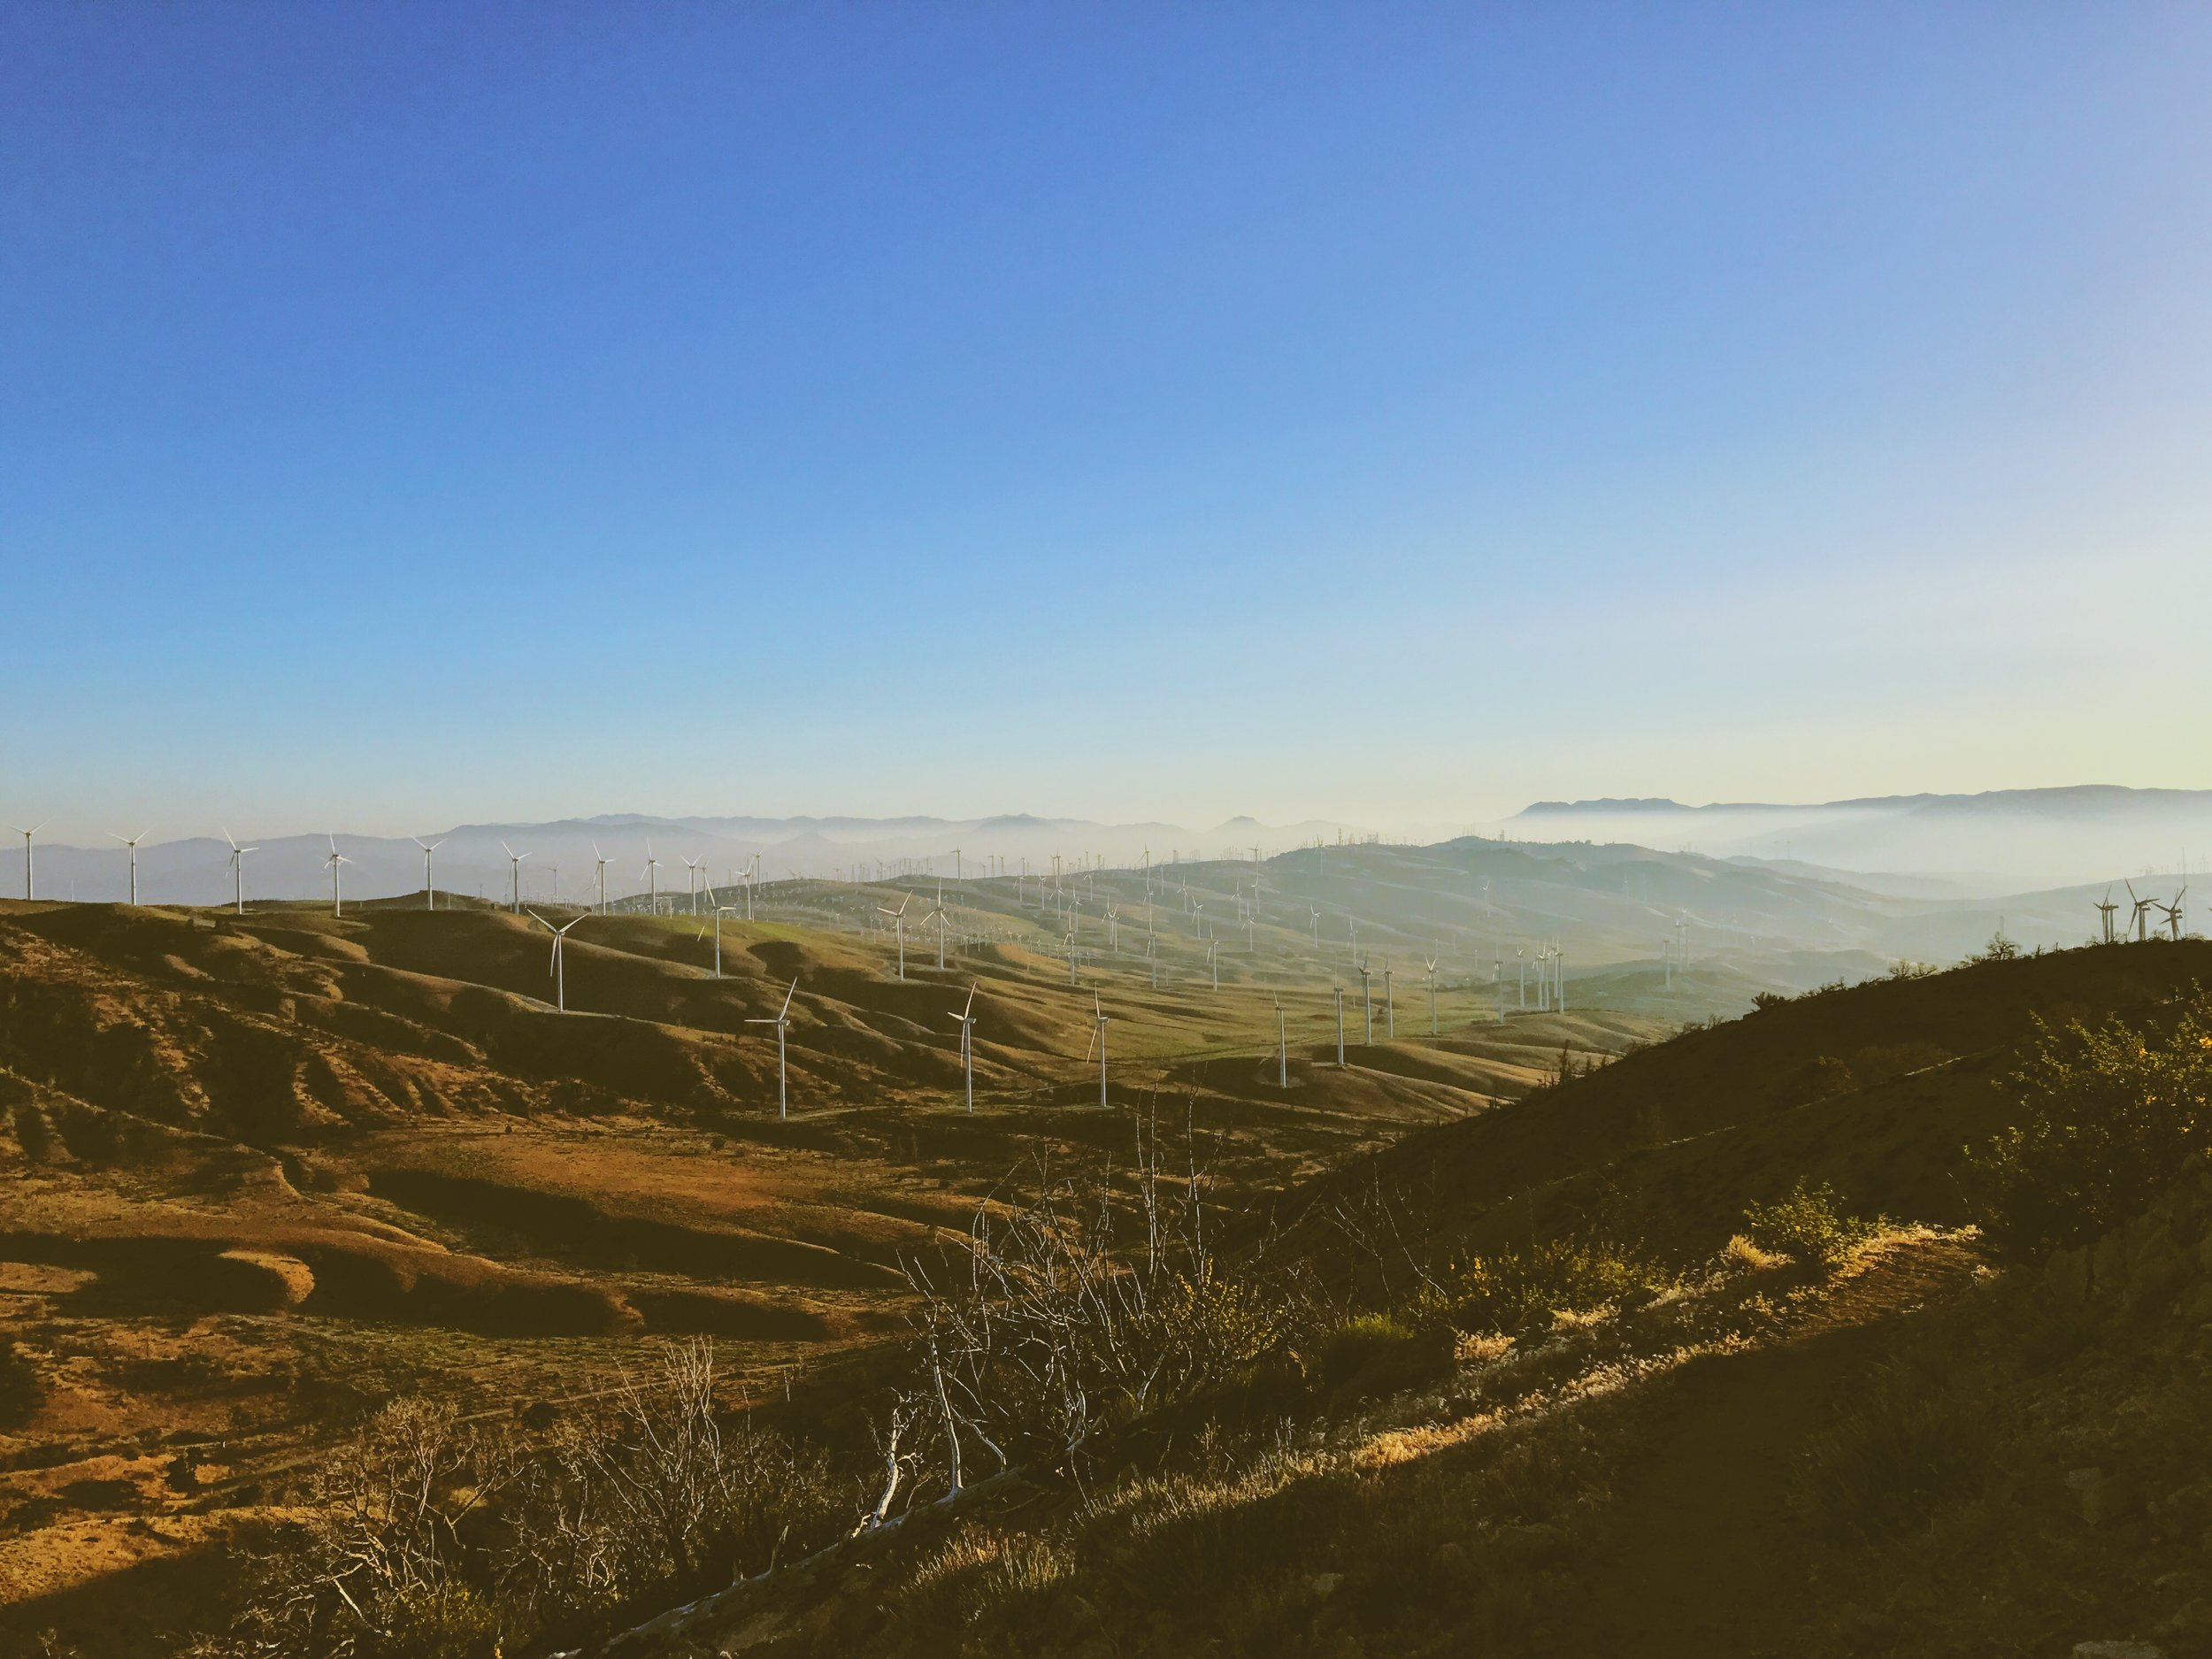 Tehachapi wind farms